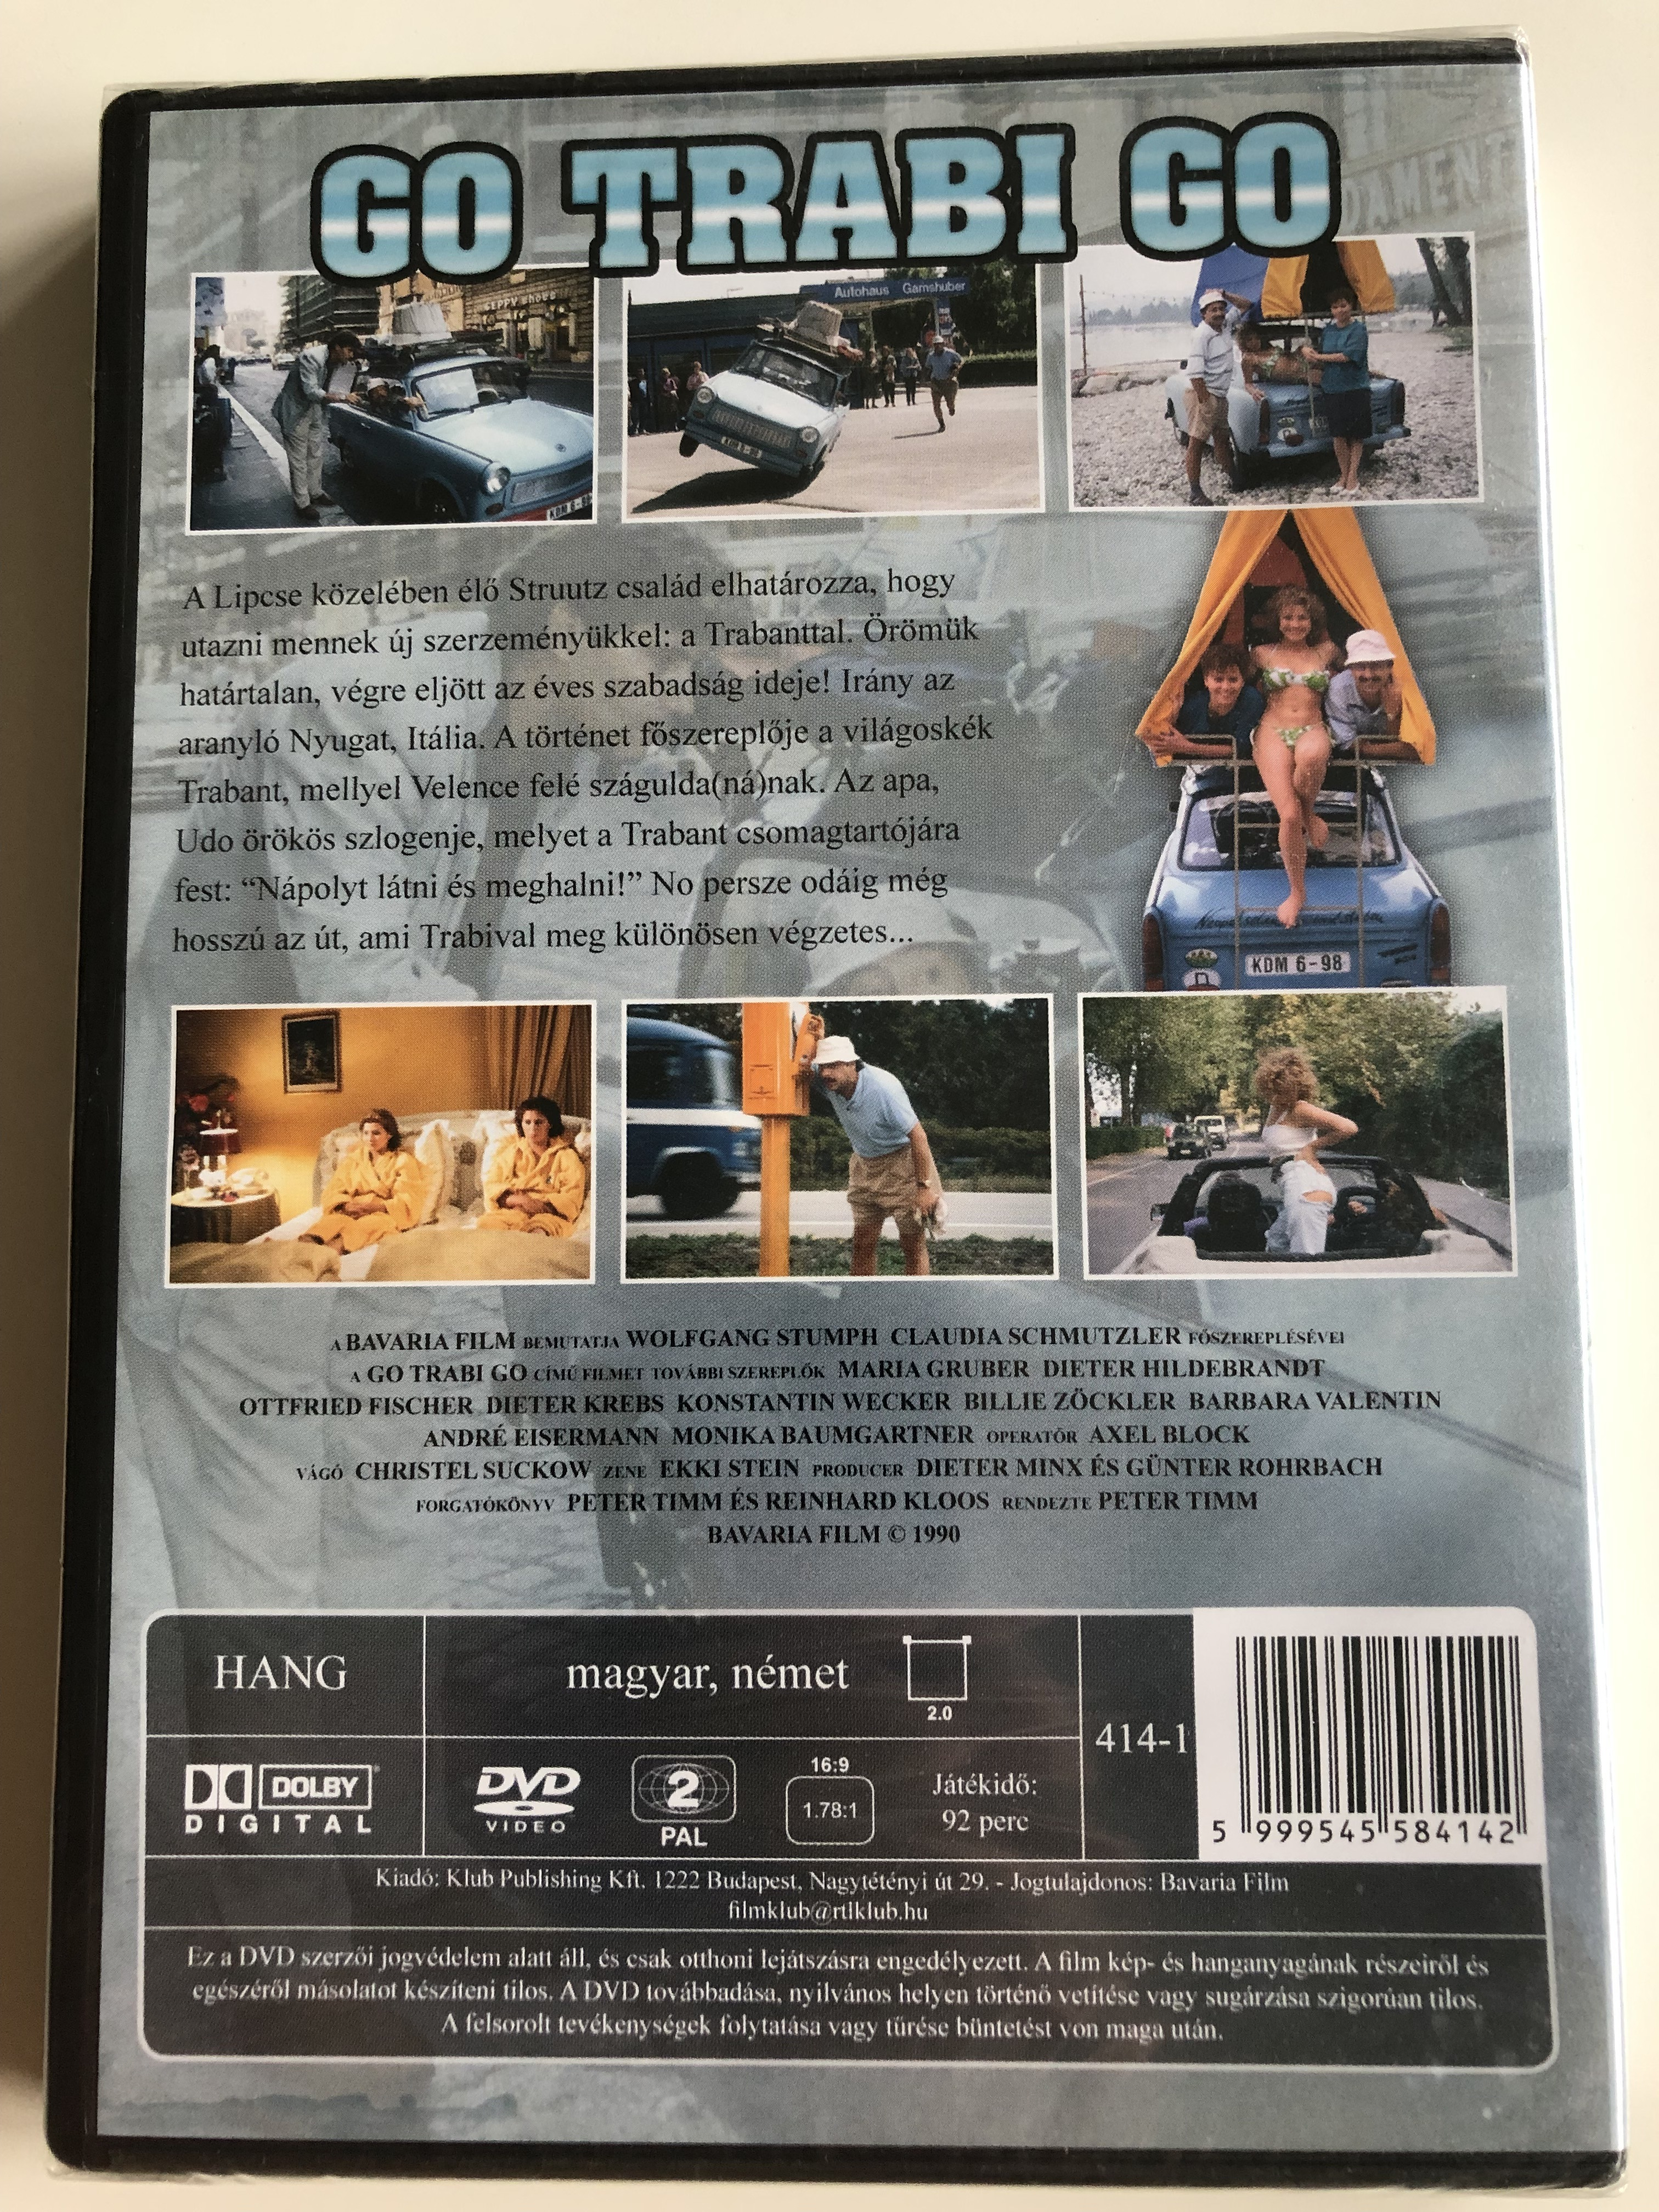 go-trabi-go-dvd-1991-directed-by-peter-timm-starring-wolfgang-stumph-claudia-schmutzler-marie-gruber-dieter-hildebrandt-ottfried-fischer-2-.jpg